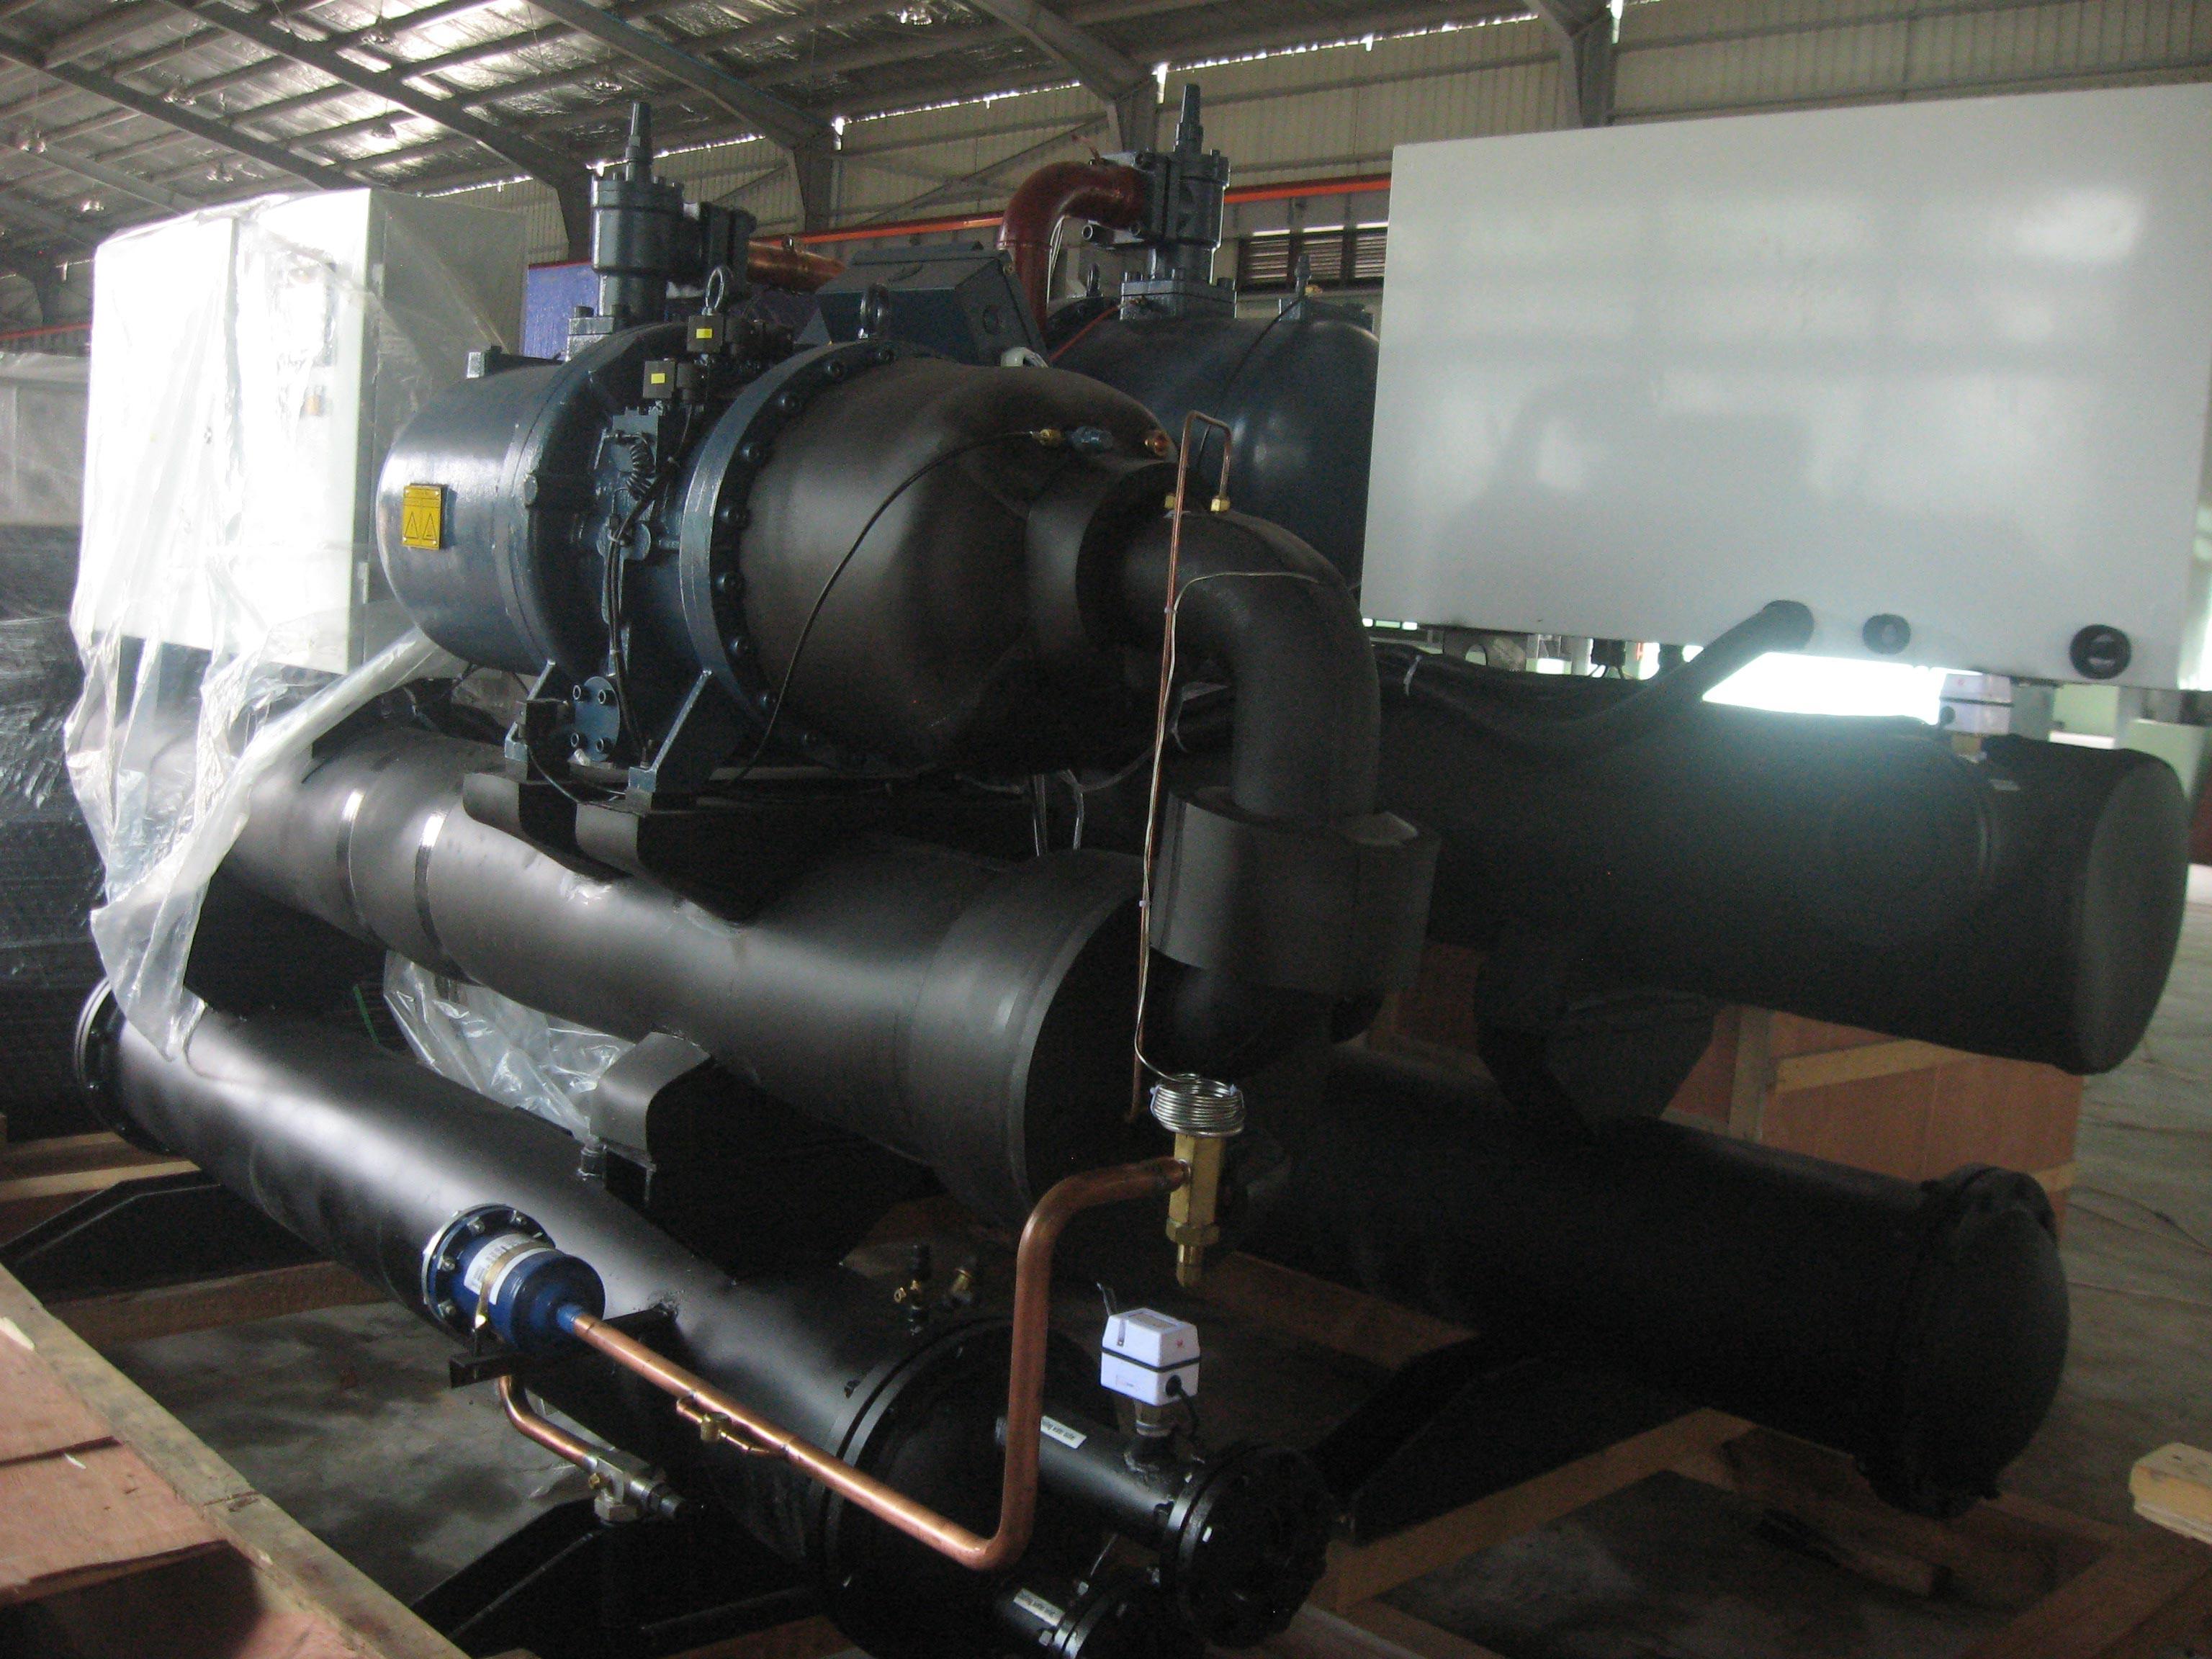 HDPE Pipe Factory (Mingalardon)